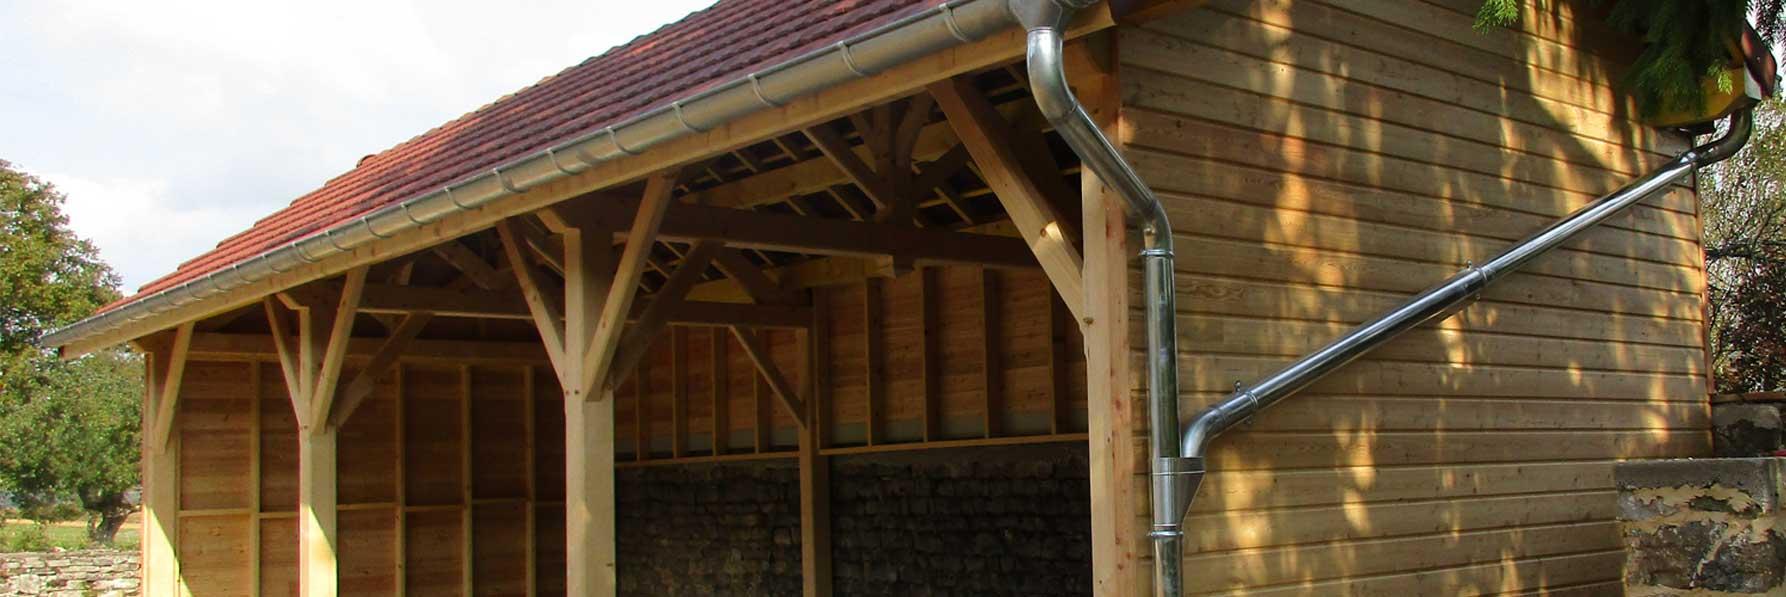 Un abri communal en bois